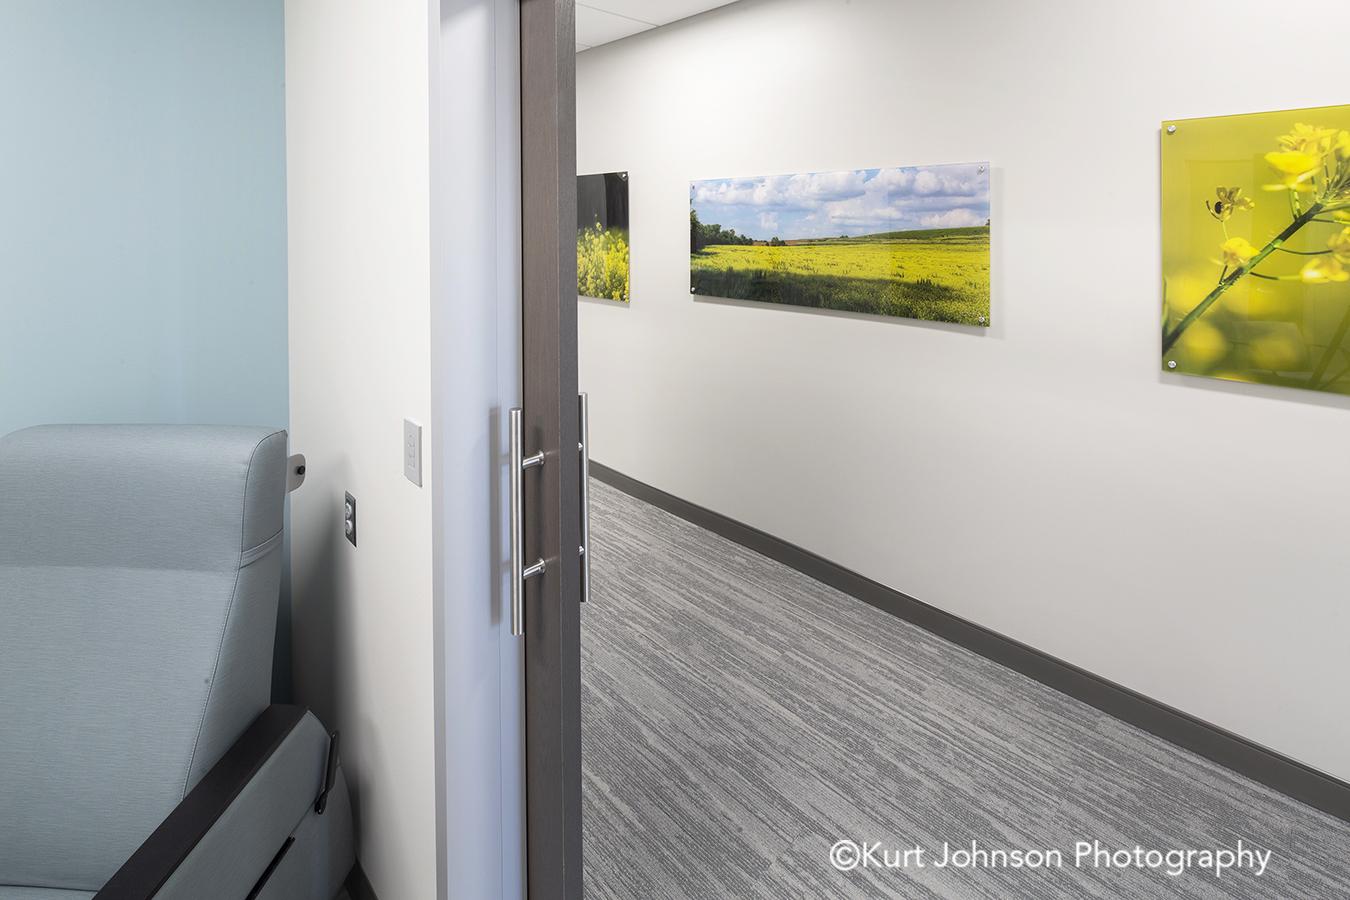 acrylic panel install healthcare installation CHI St Saint Francis Grand Island Nebraska clinic cancer treatment hallway corridor landscape botanical